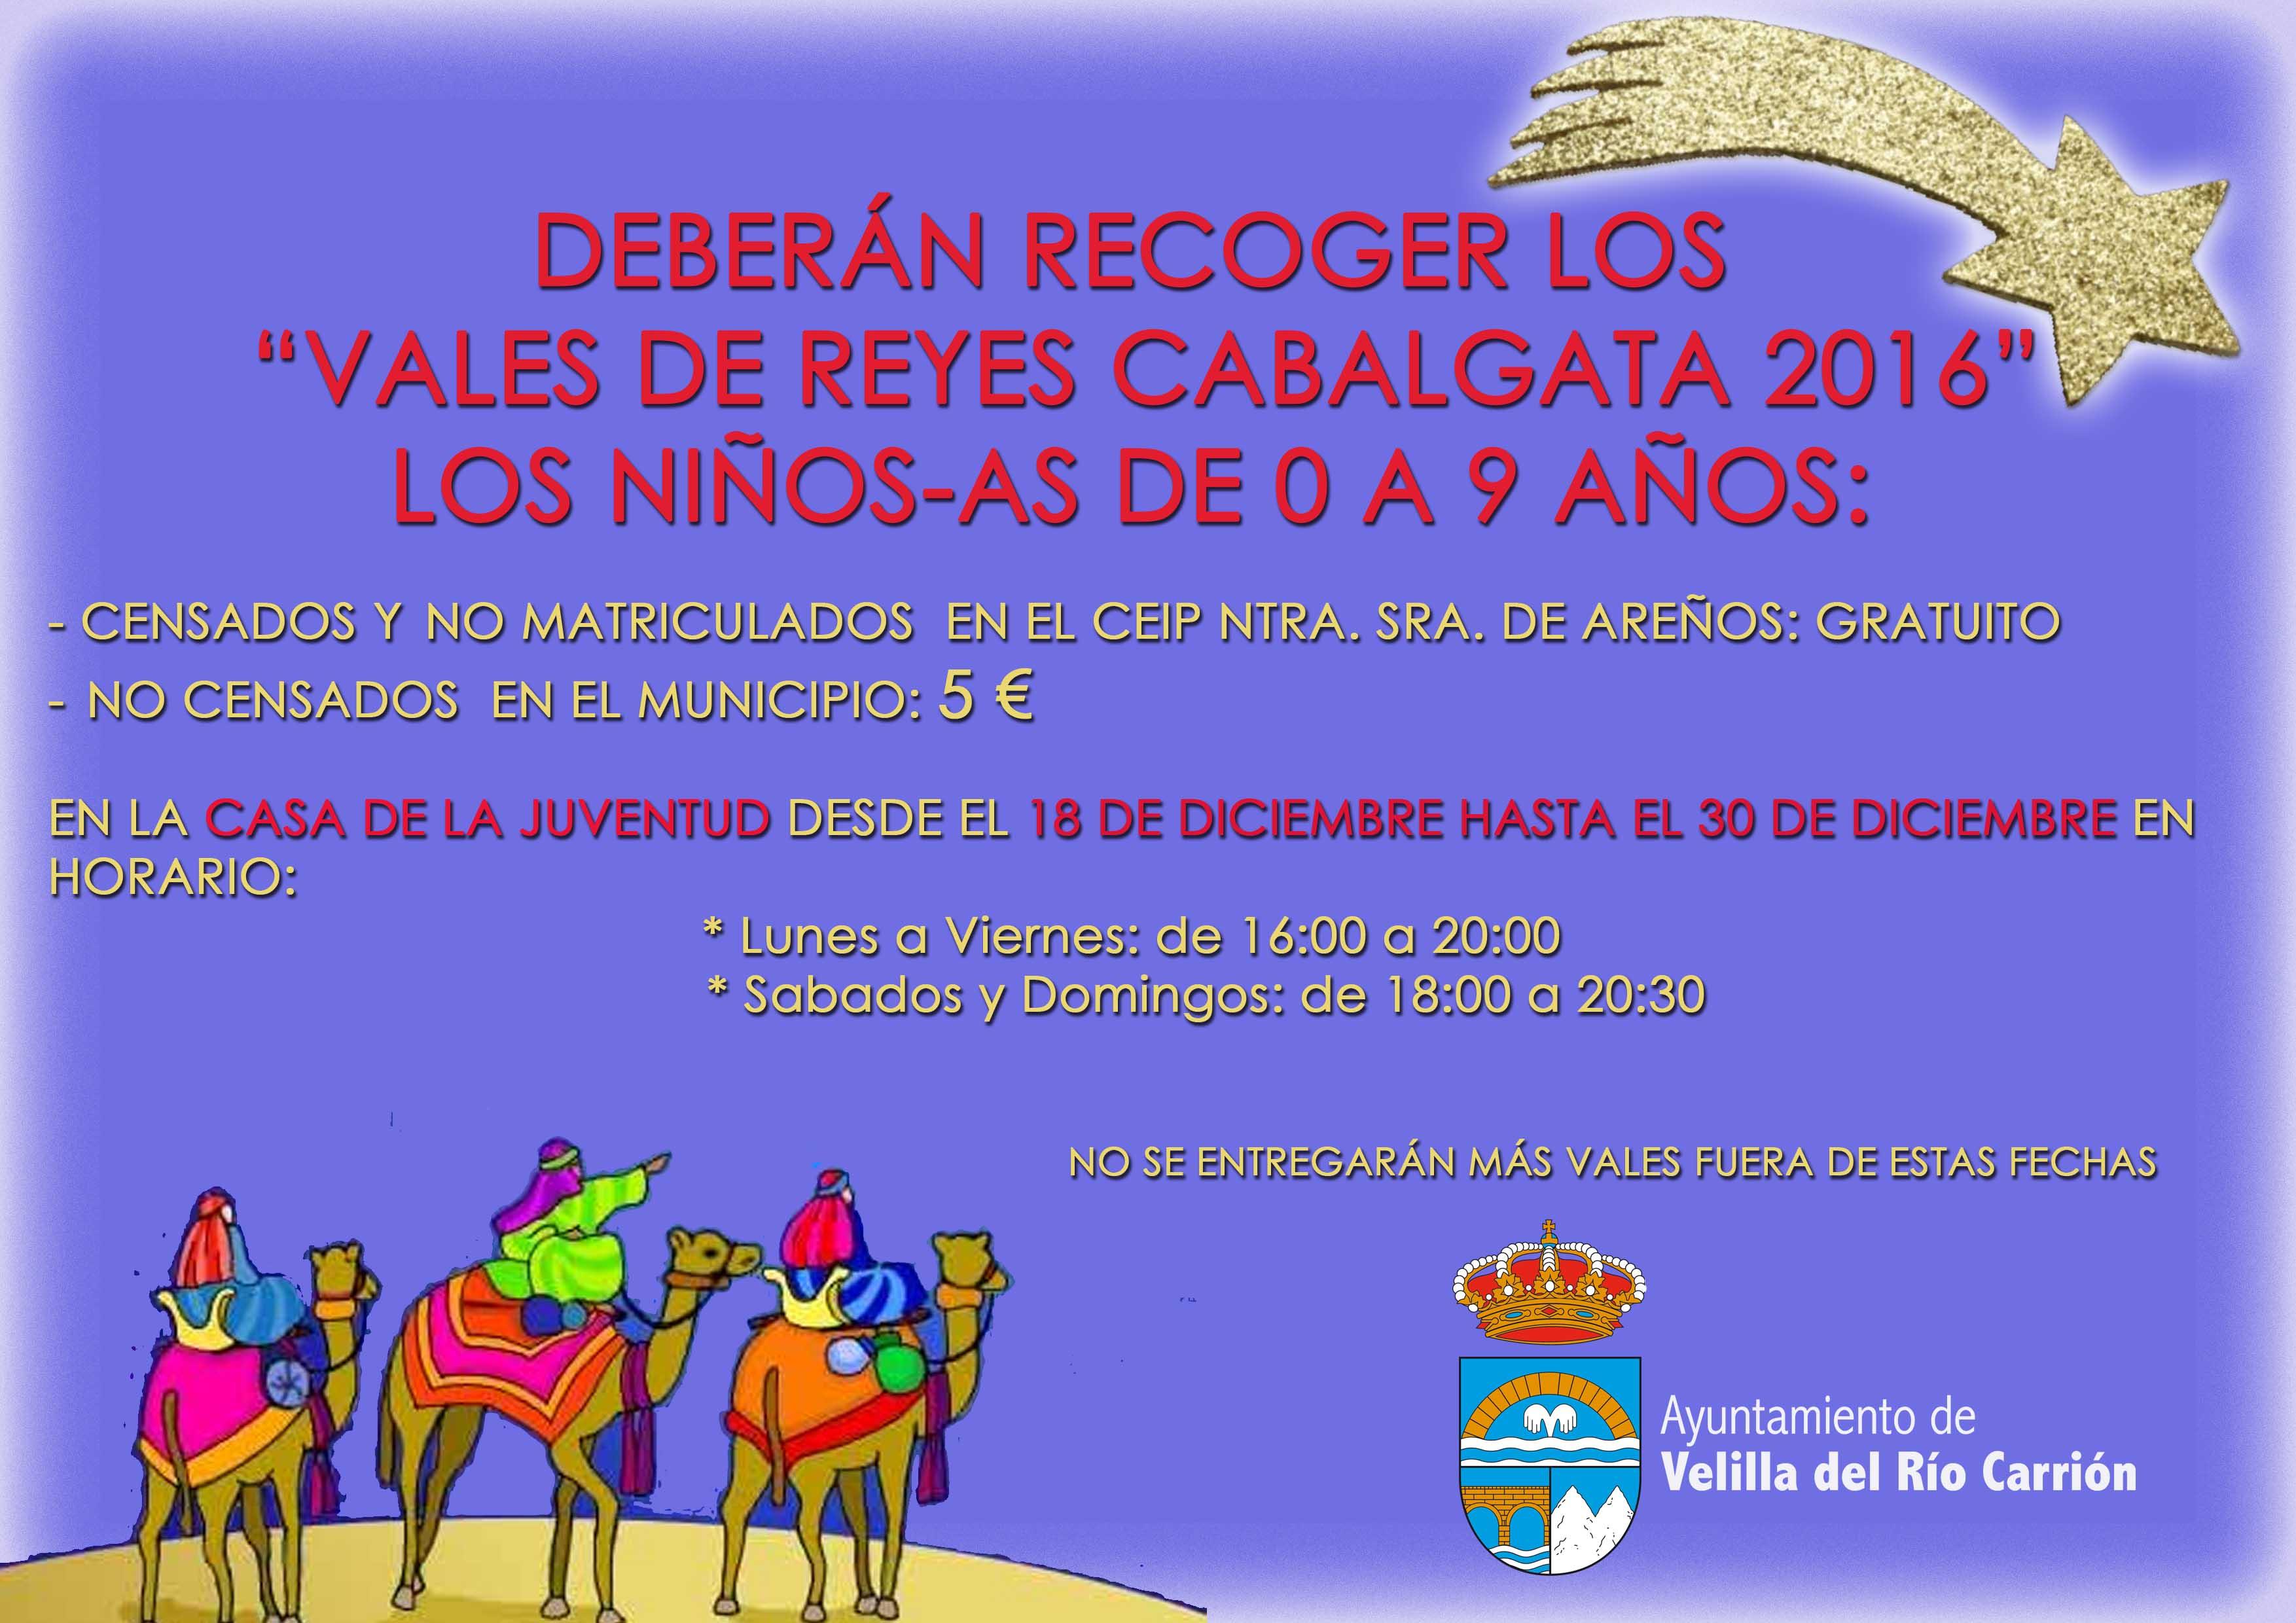 RECOGIDA VALES REGALO CABALGATA